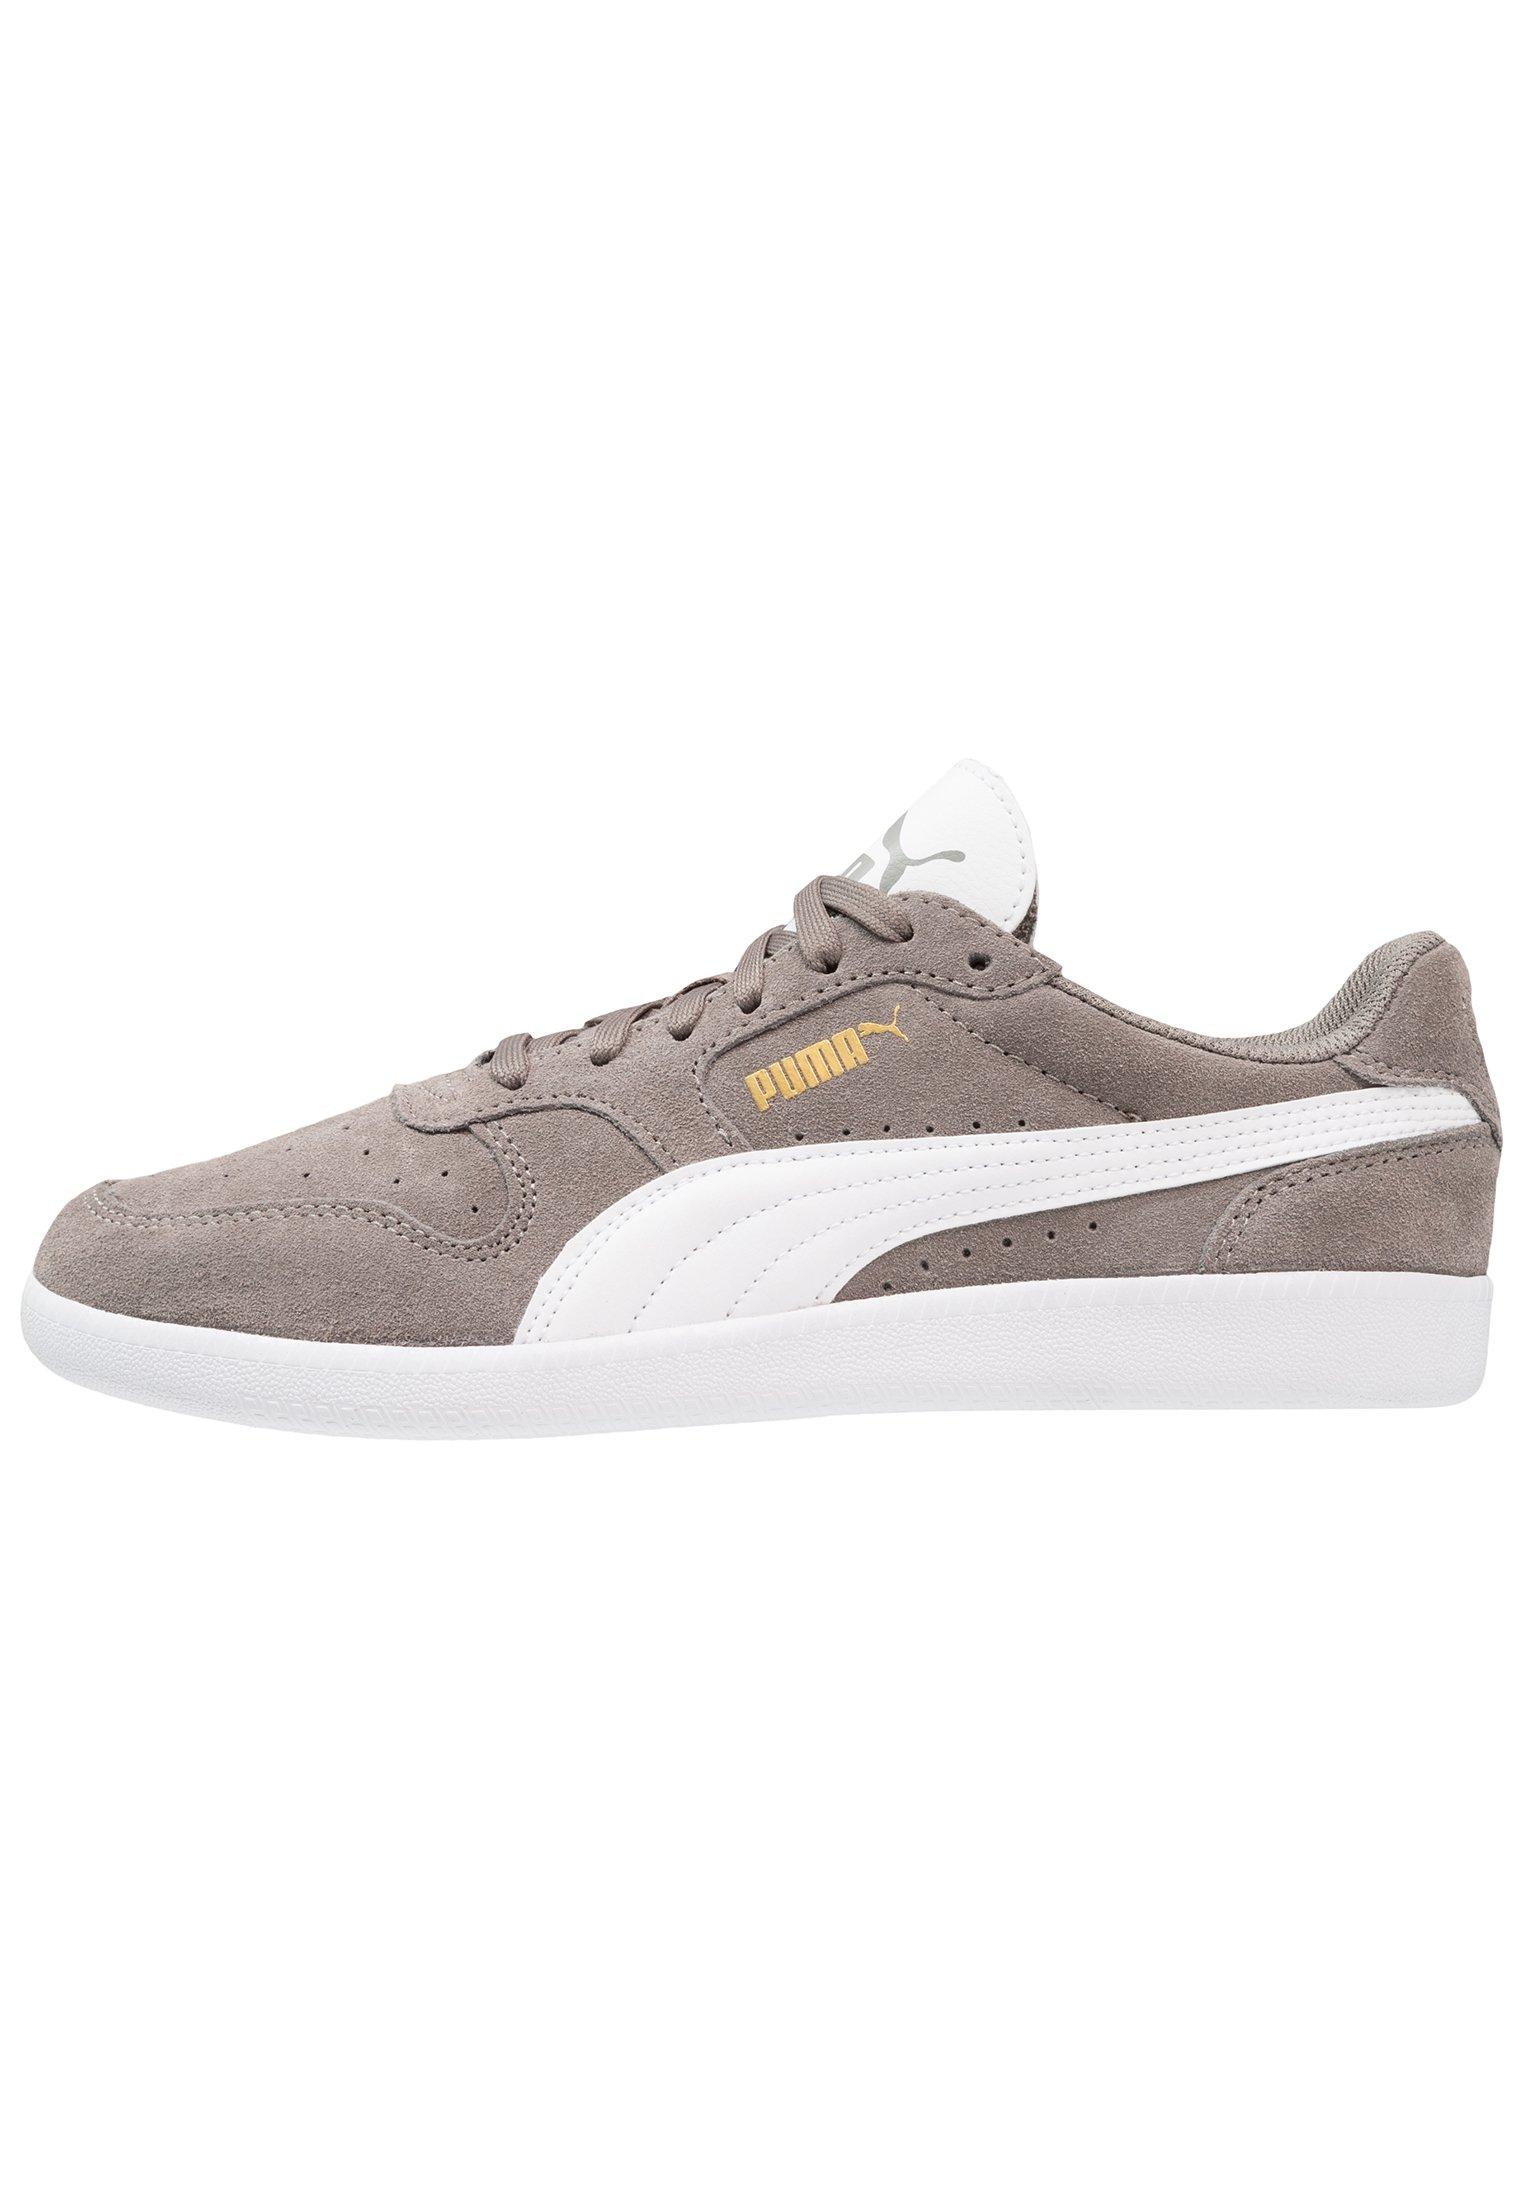 Puma ICRA TRAINER SD - Trainers - steel gray/white/grey - Zalando ...